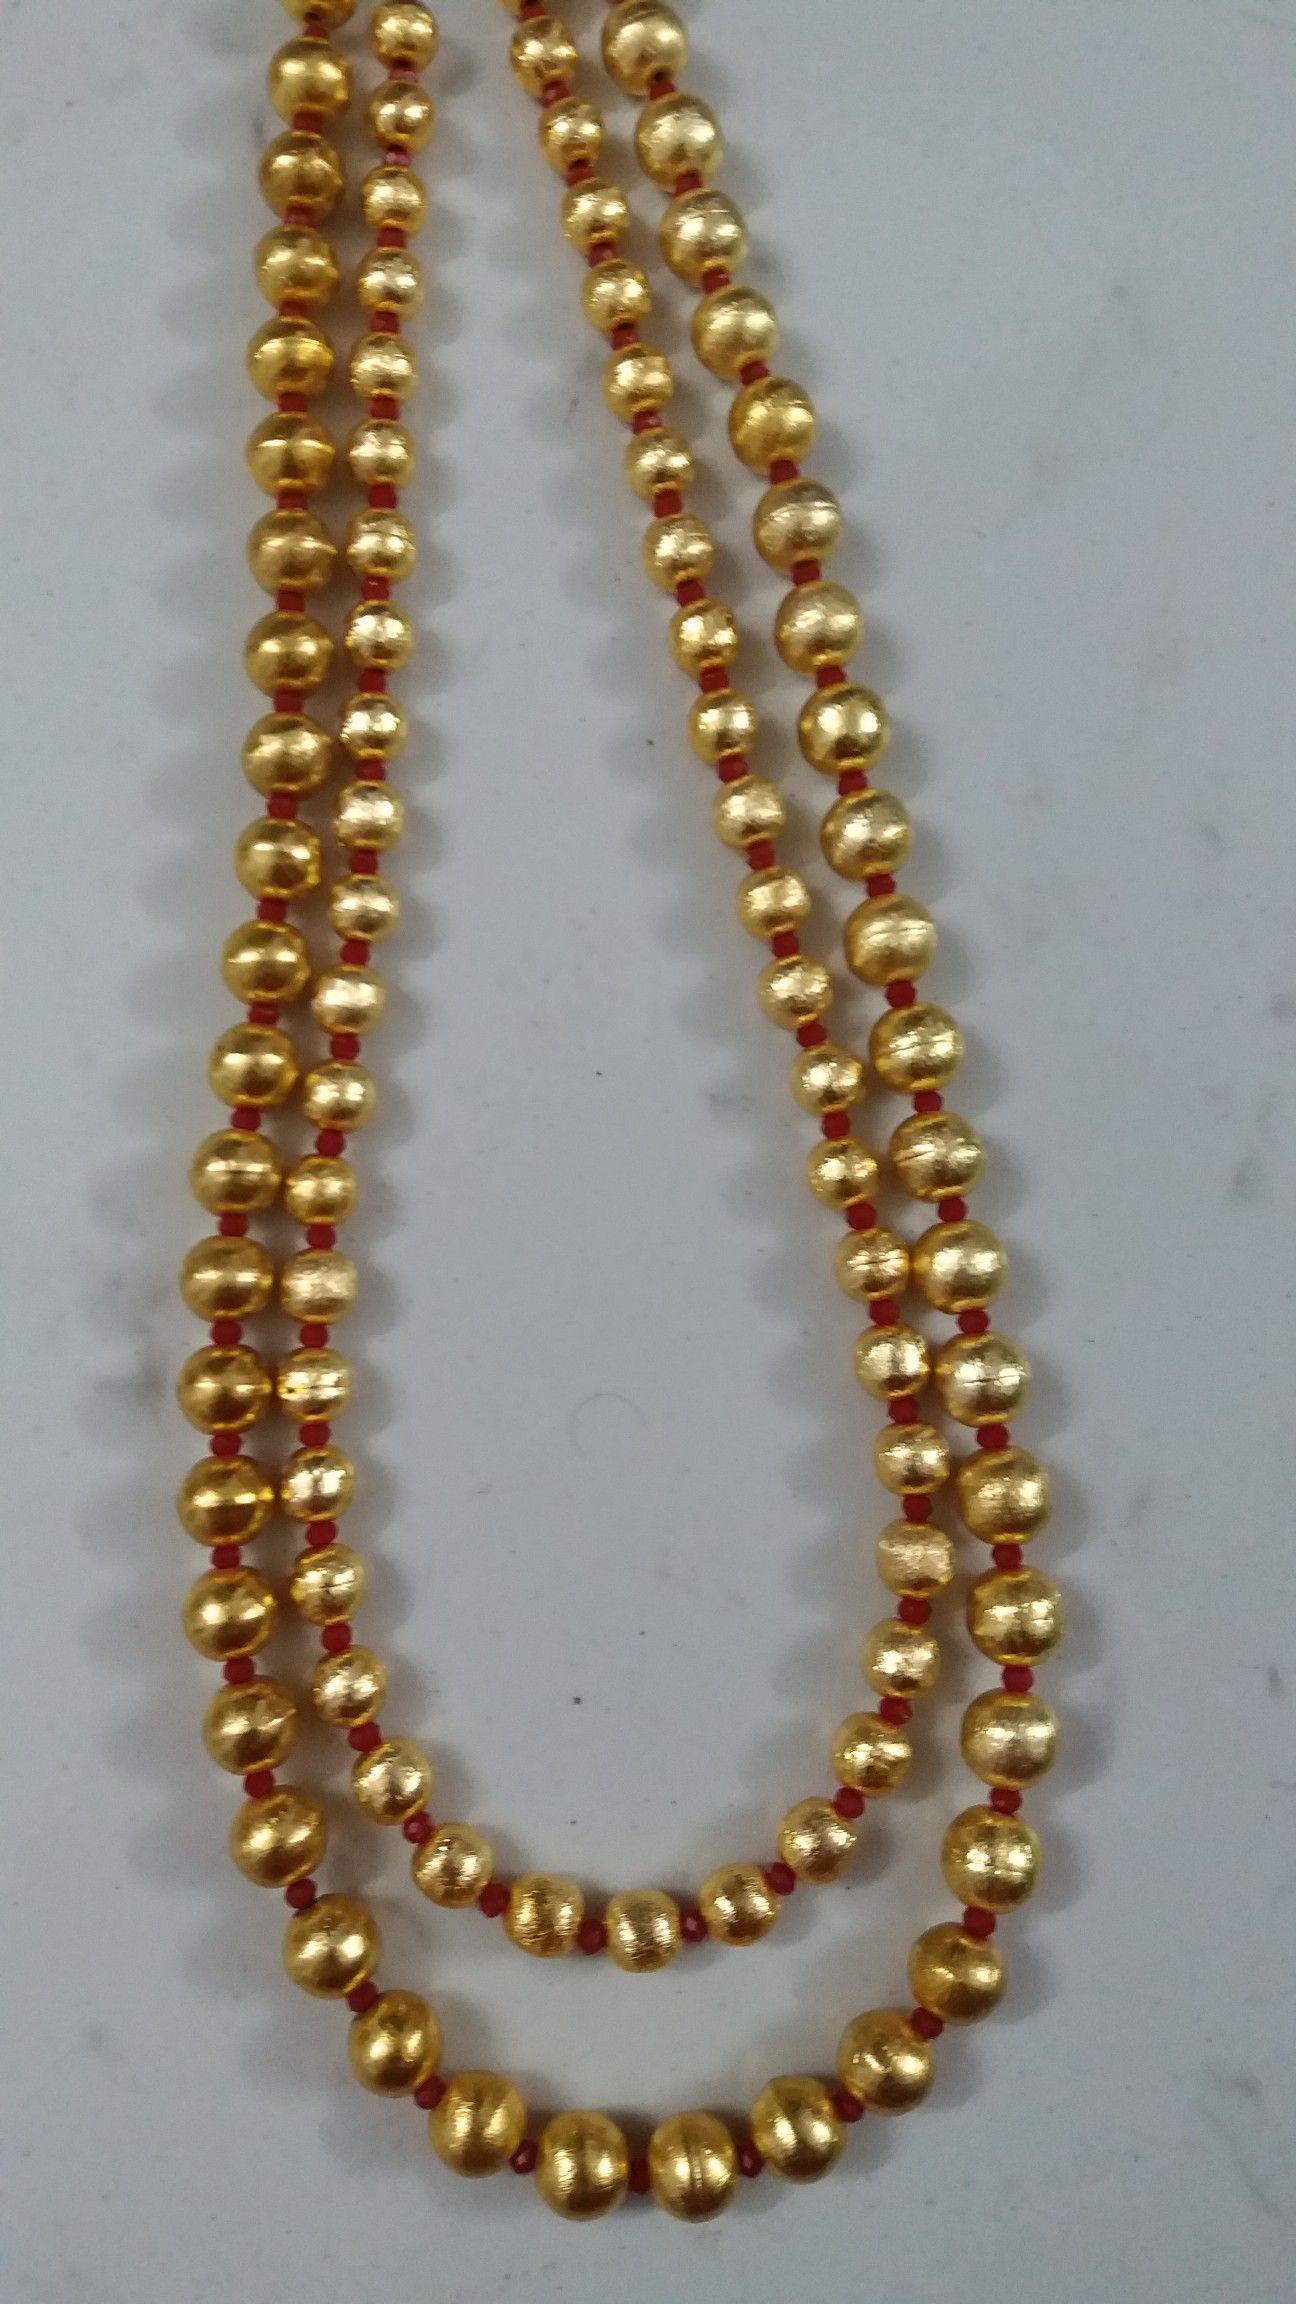 Golden beaded chain